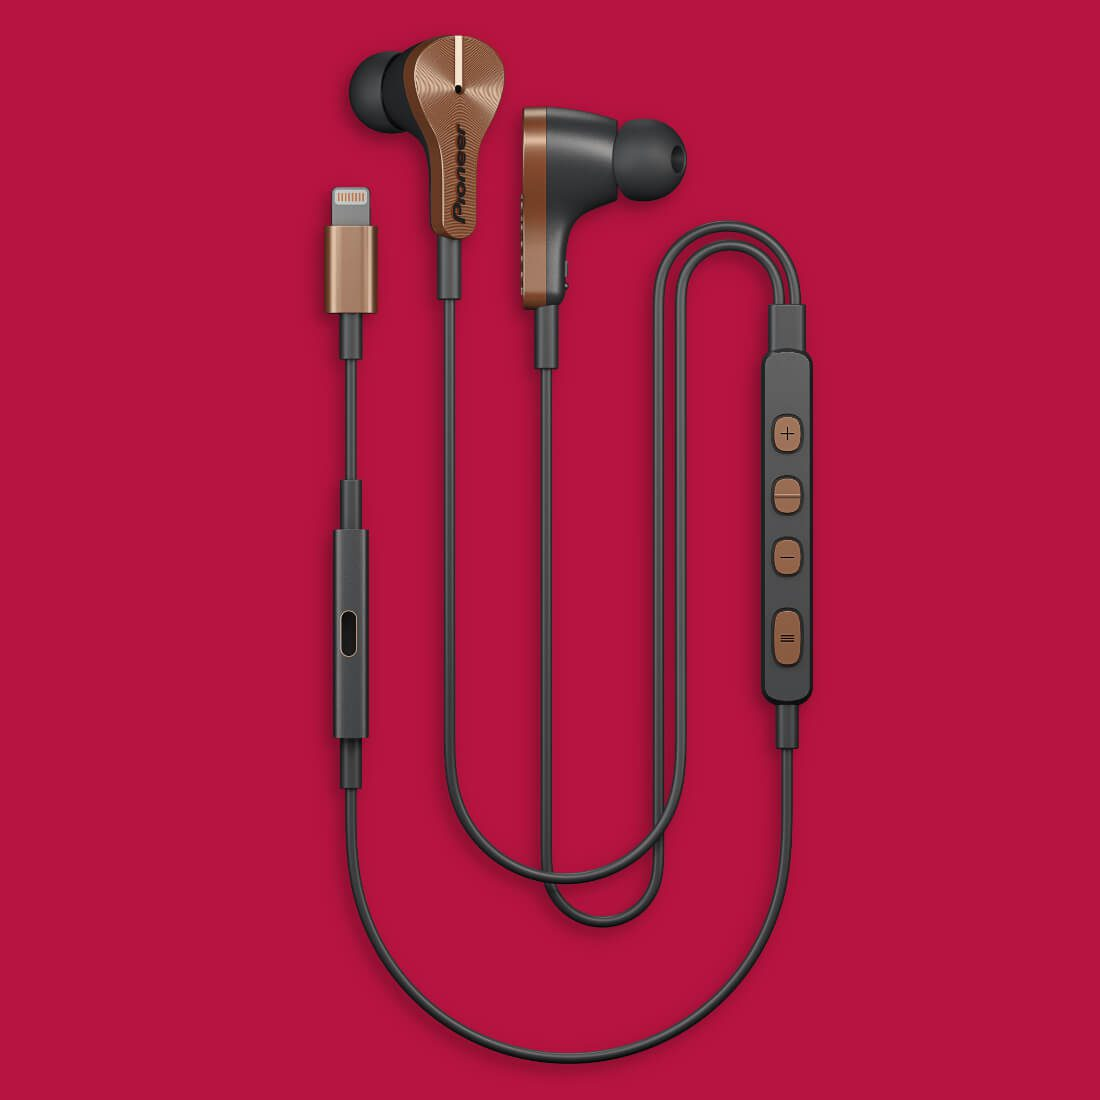 rayz-plus-earphones_soldier_laydown_bronze_redbg_shadow